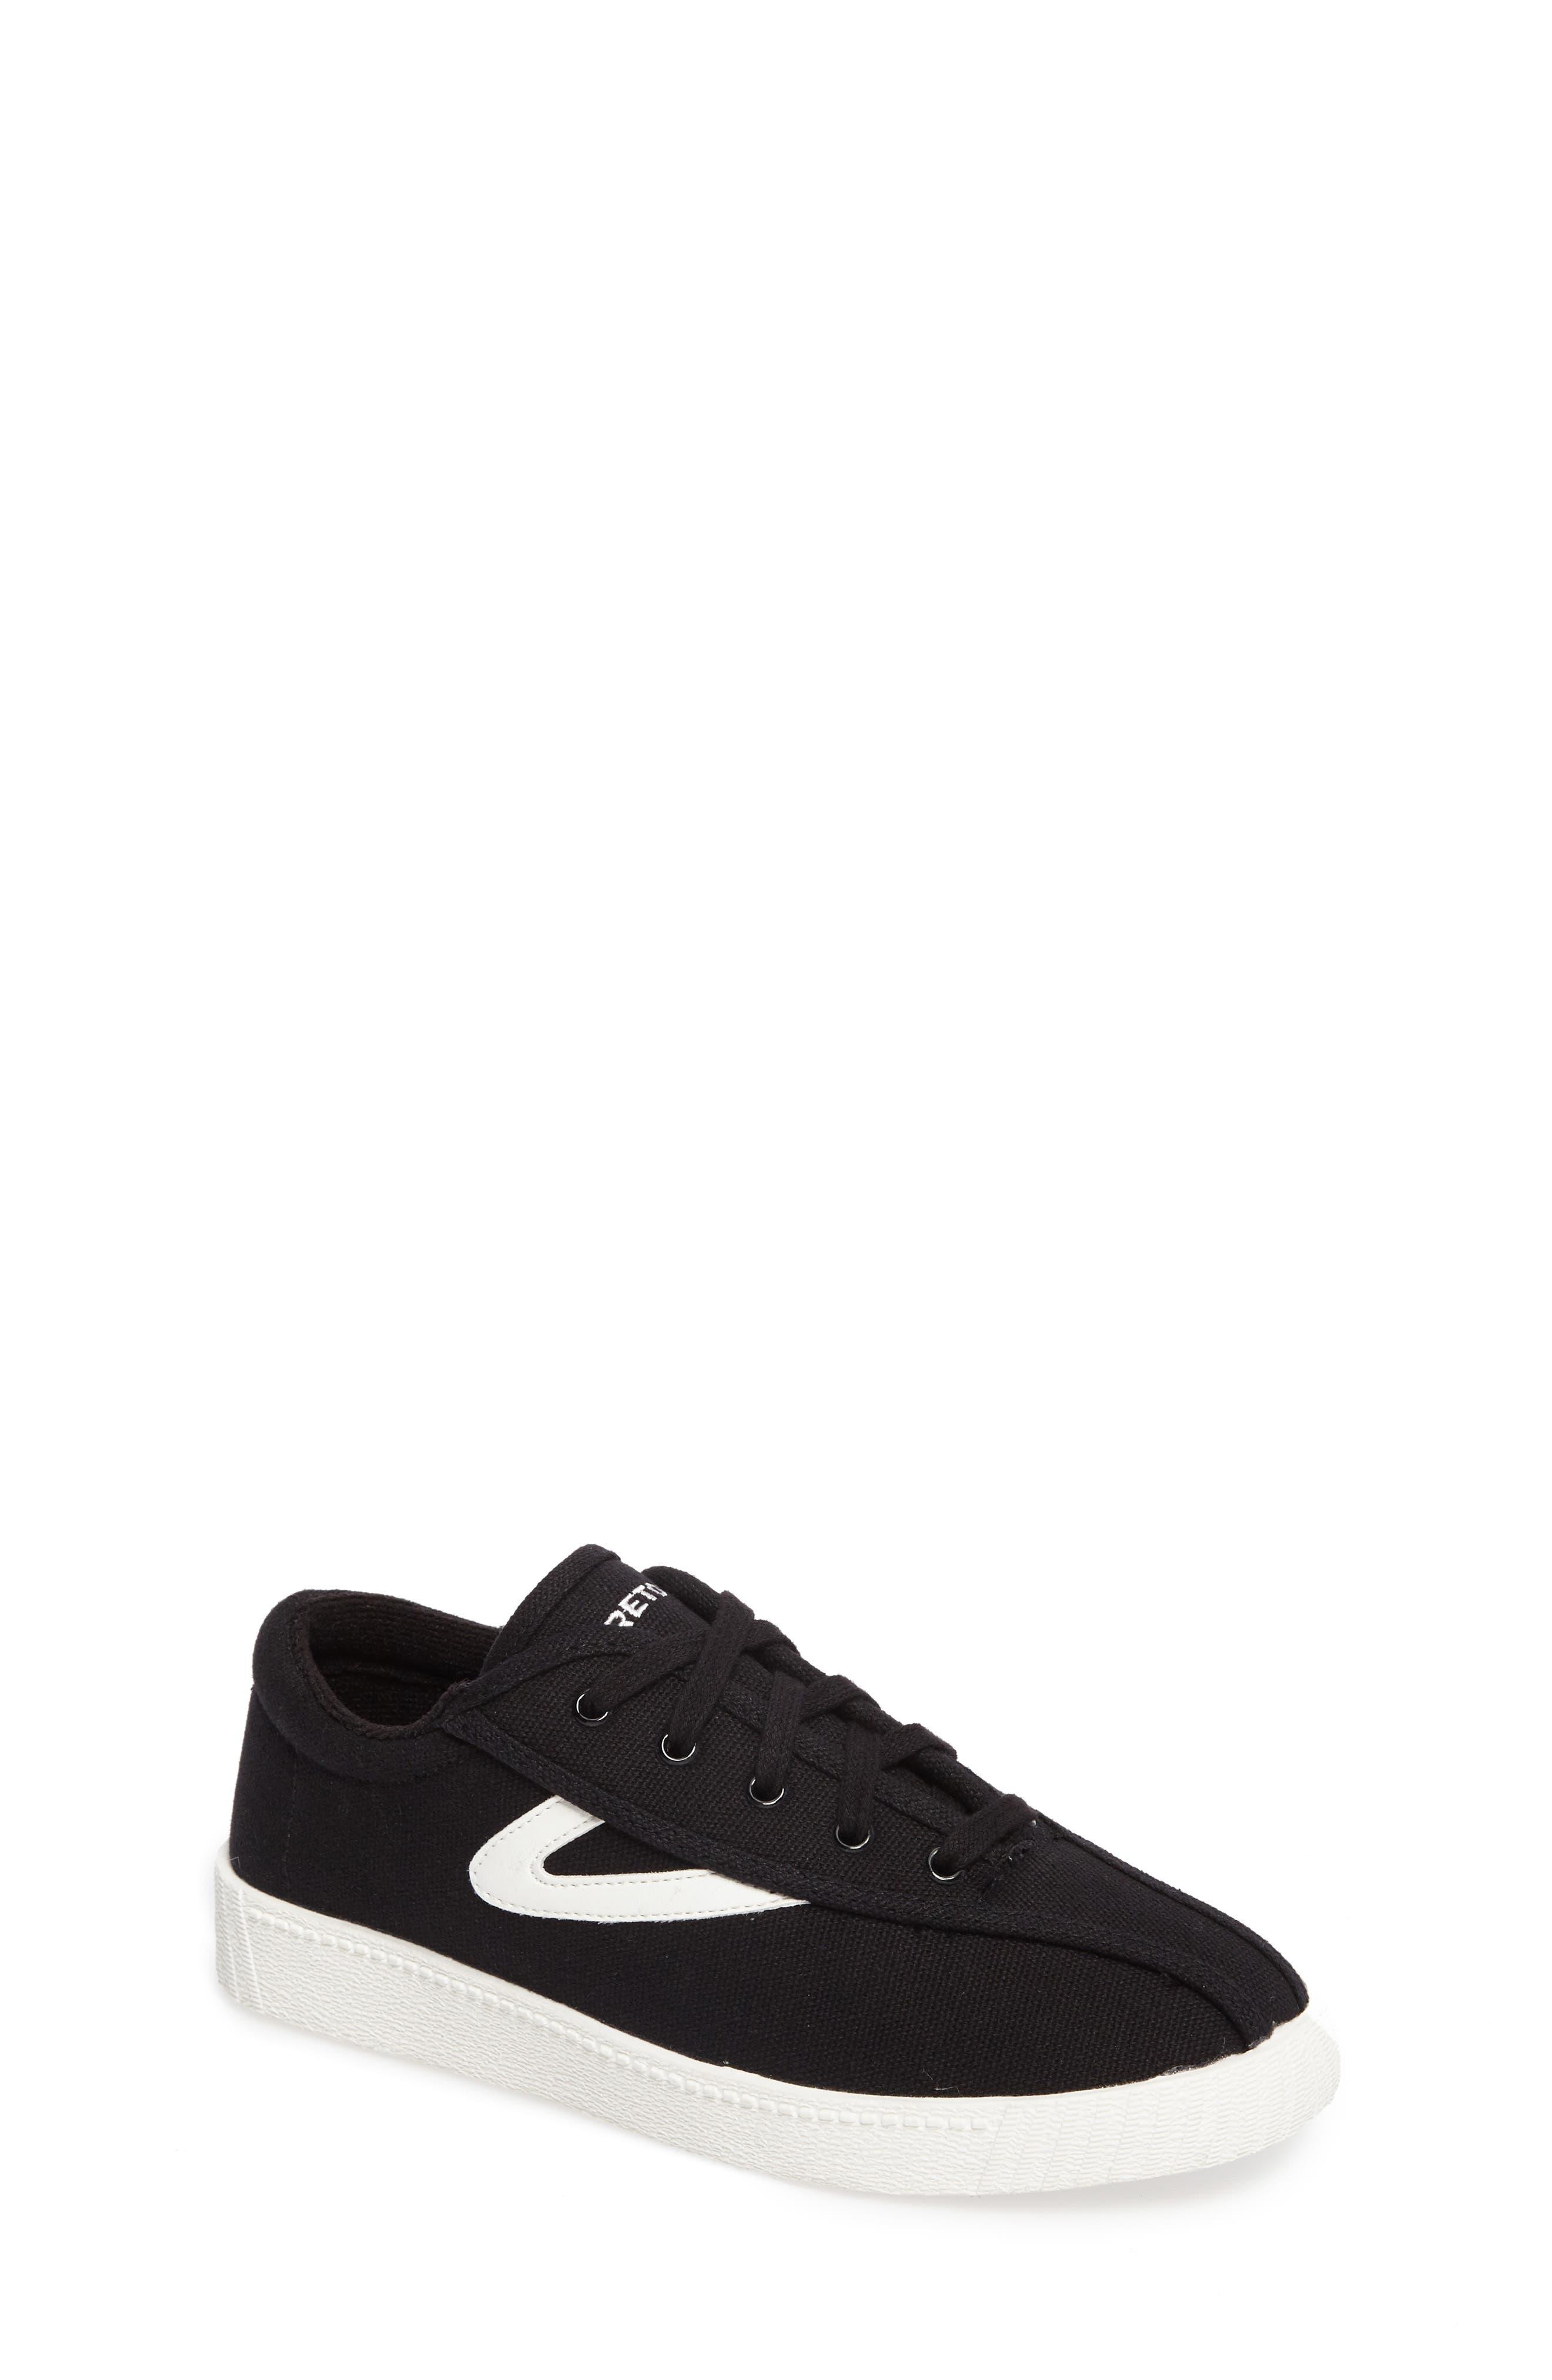 TRETORN Nylite Plus Sneaker, Main, color, 012